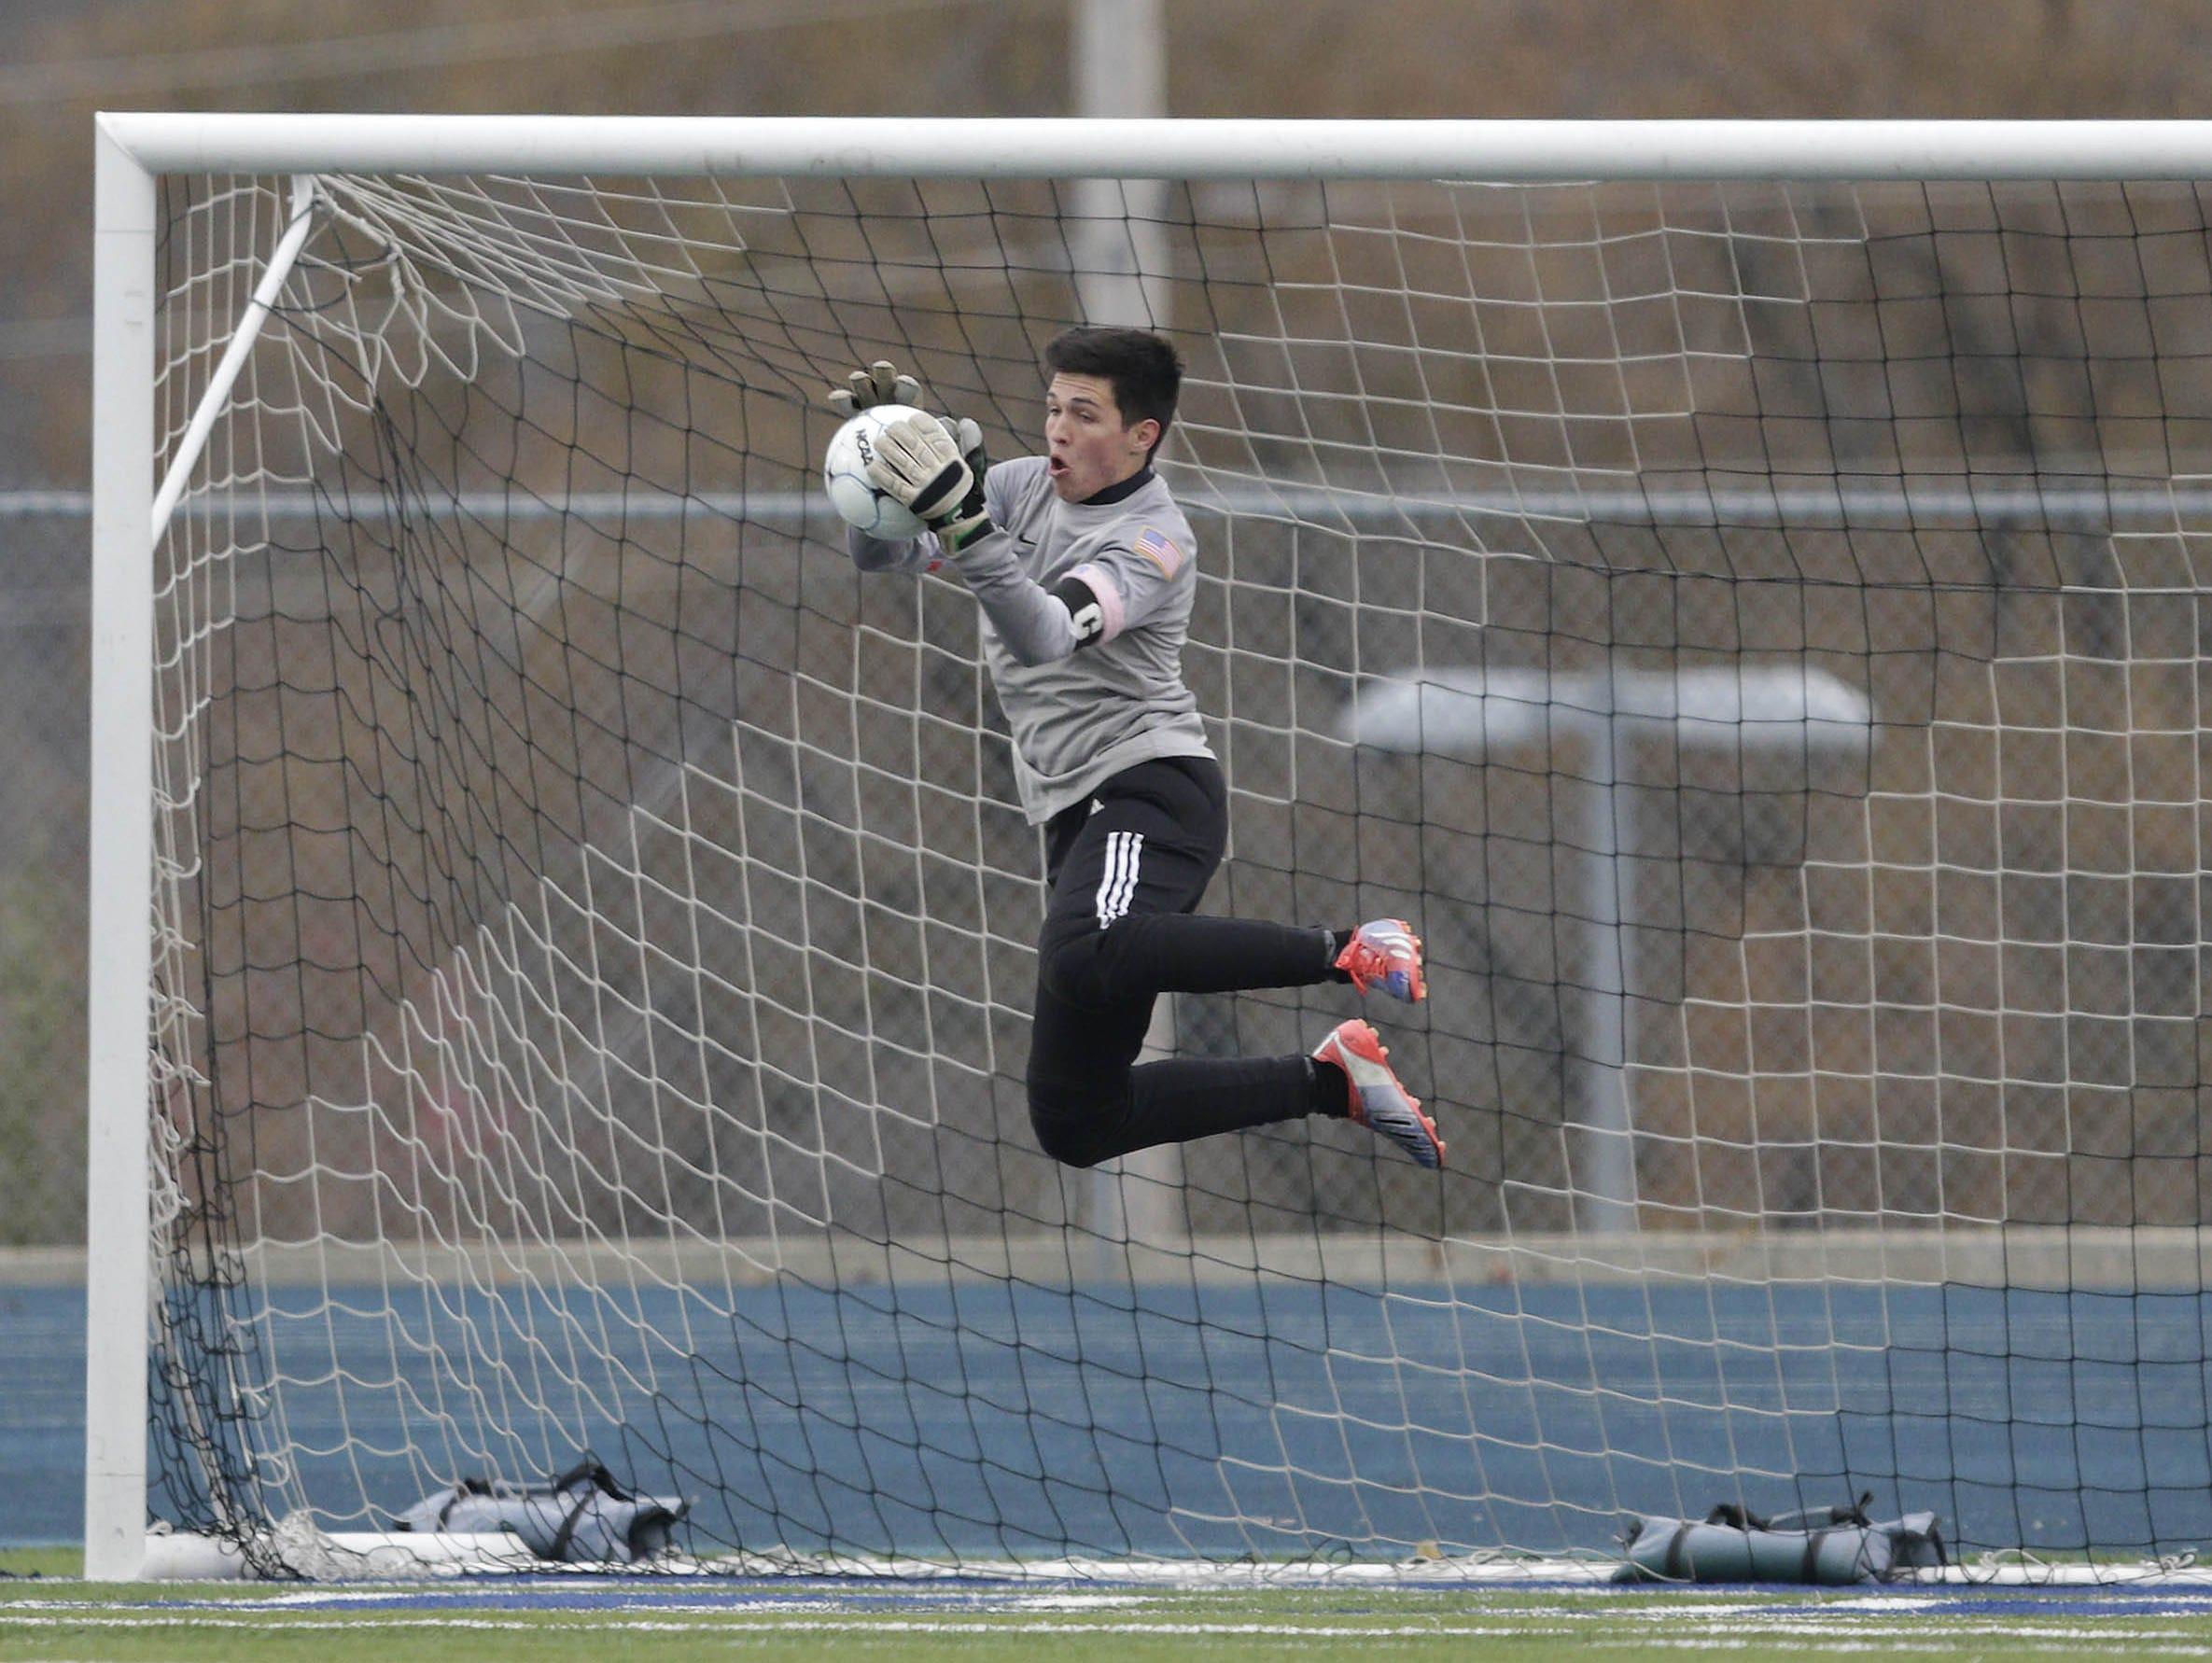 Glendale senior goalkeeper Nicholas Lantz was named Class 3 goalkeeper of the year three times by the Missouri High School Soccer Coaches Association.